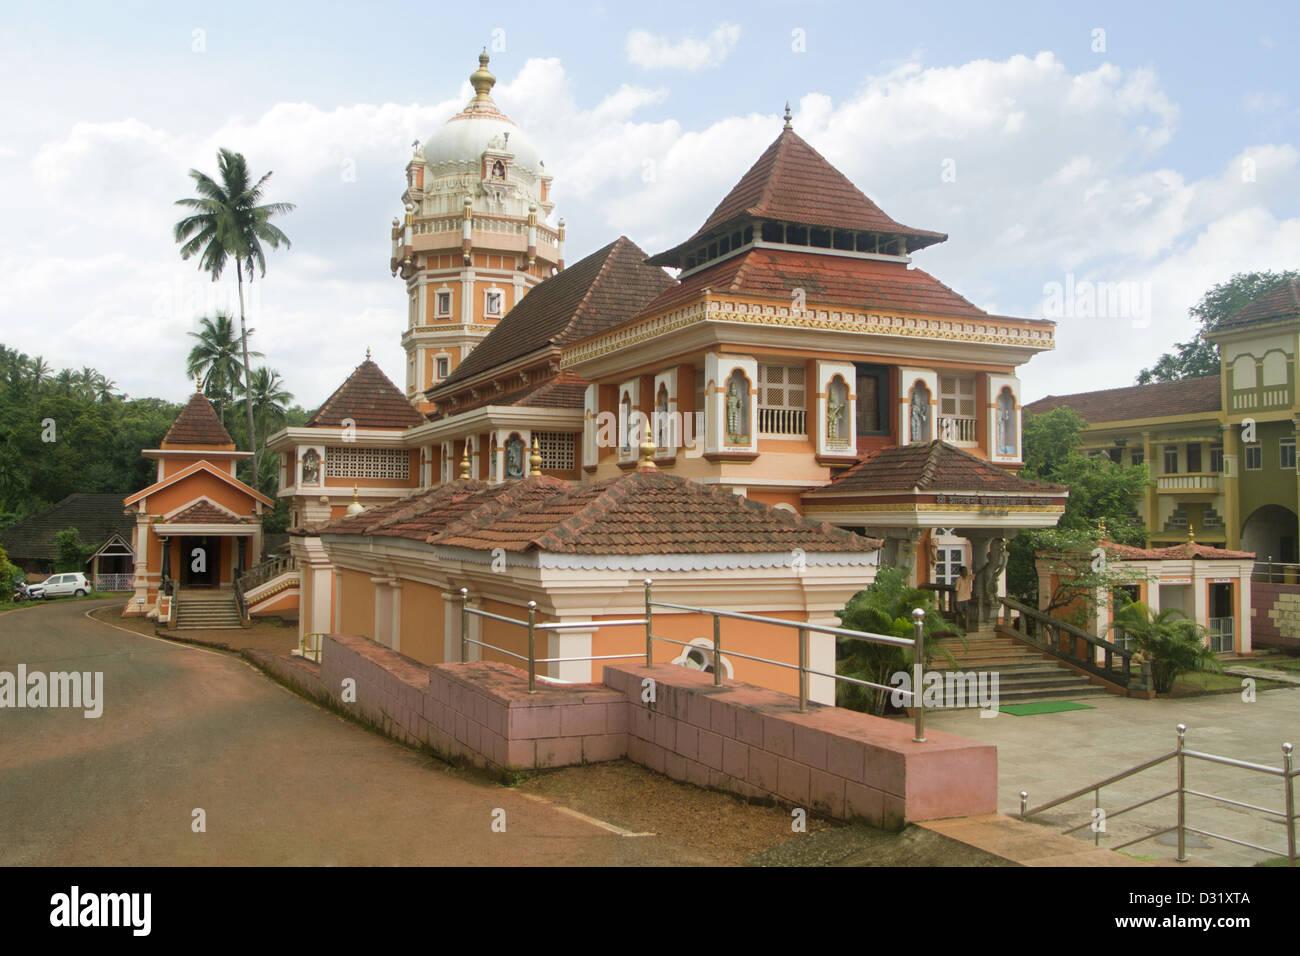 Shri Devi Templo Shantadurga, a 33 km de Panaji en el piedemonte de la aldea de Ponda Taluka Kavalem, Goa, India Foto de stock